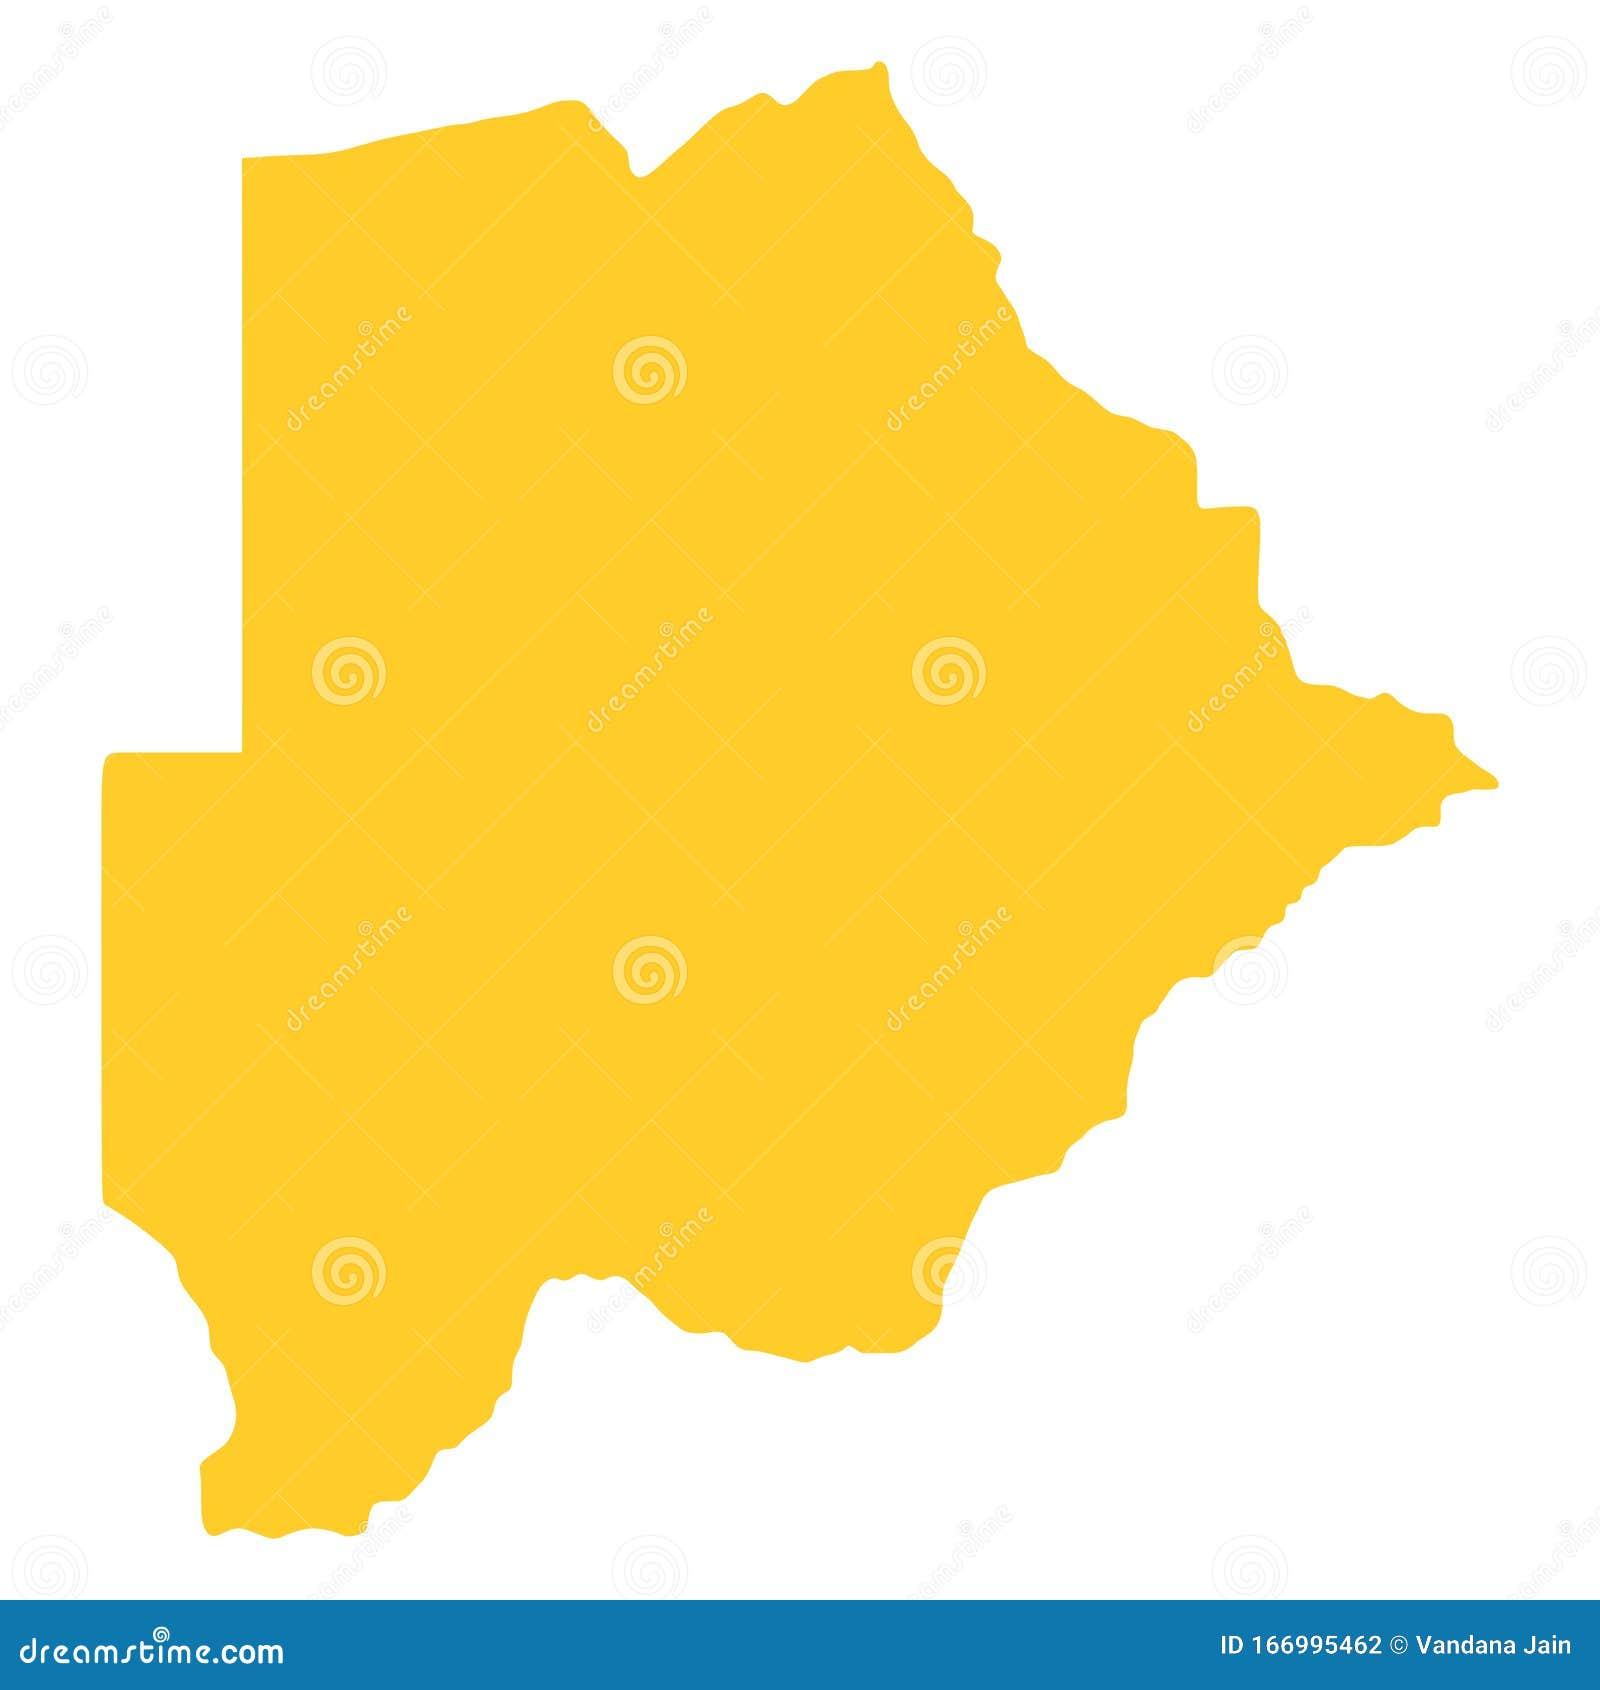 Picture of: Botswana Map Of Botswana Vector Silhouette Stock Vector Illustration Of Animals Landlocked 166995462